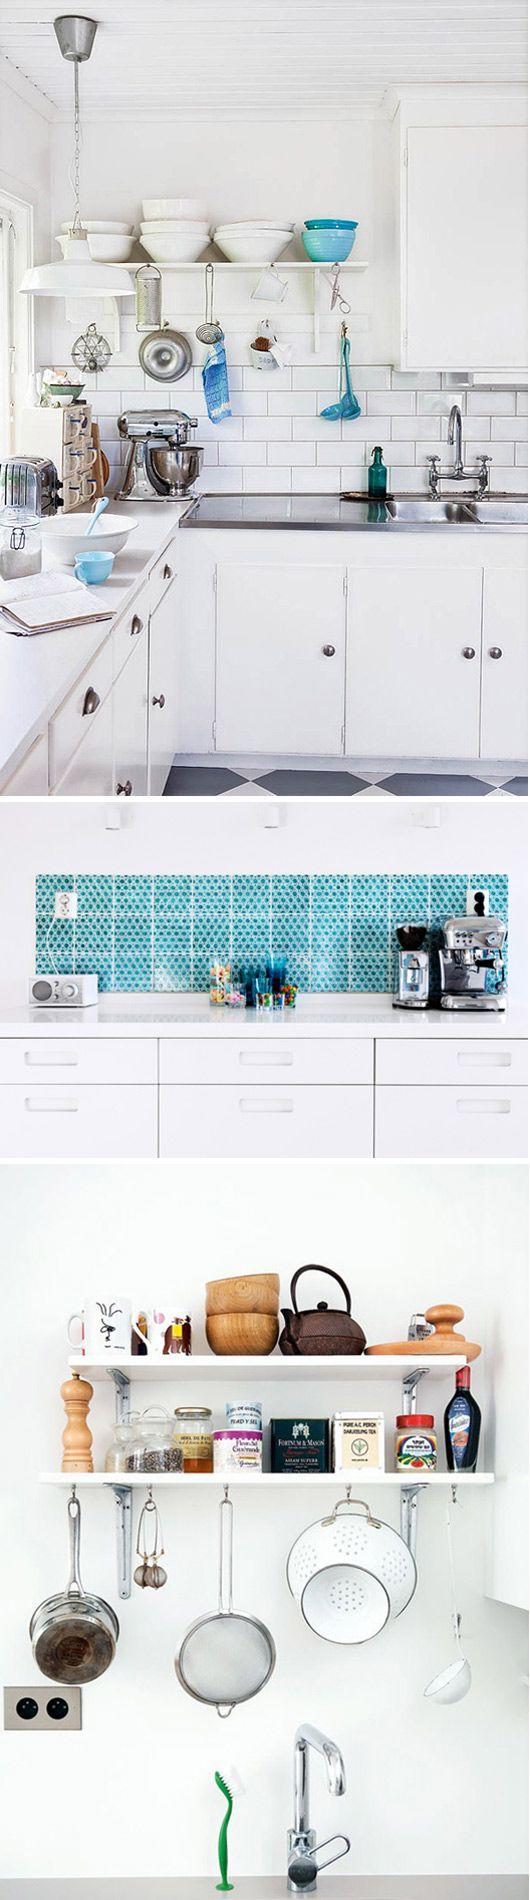 kitchen kitchen kitchen!